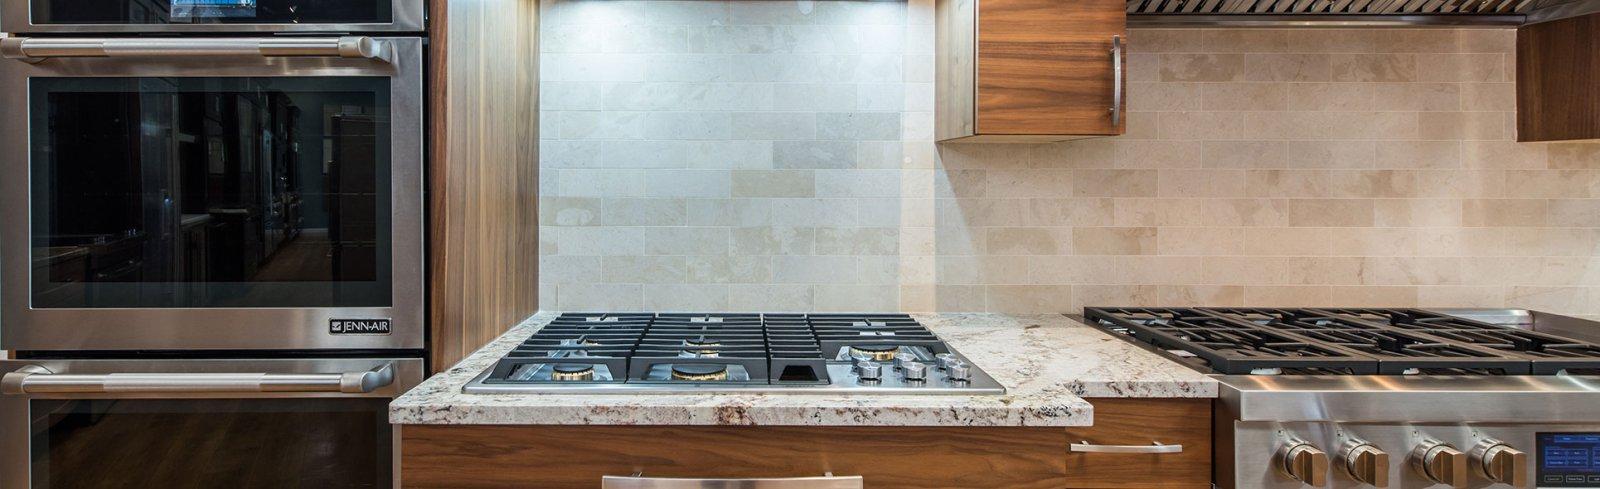 Visit Bray Amp Scarff Appliance Amp Kitchen Specialists